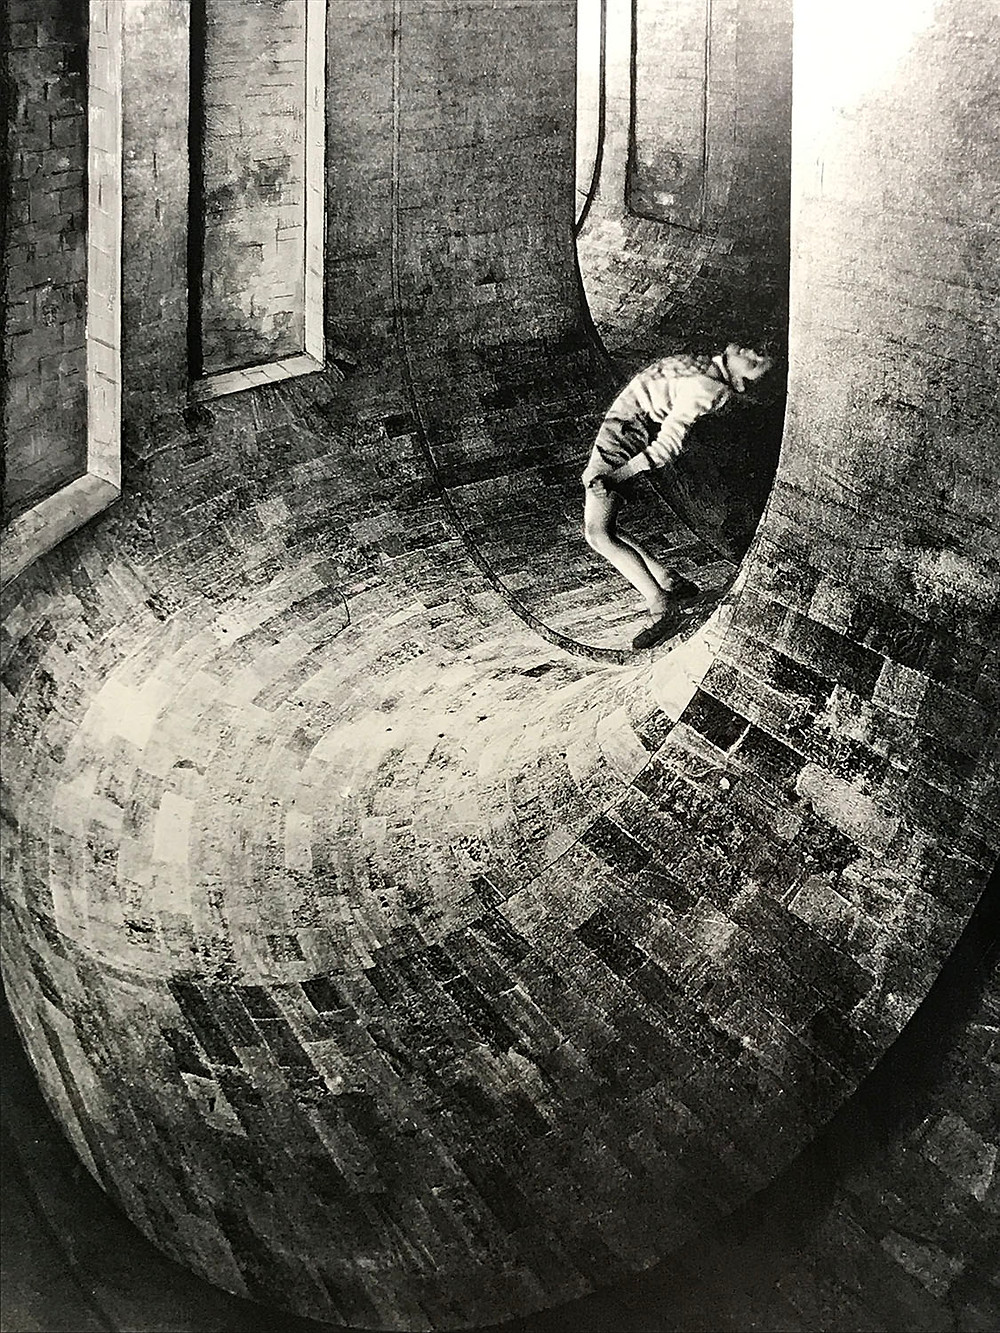 Fotografia surrealismo di Dora Maar 1936